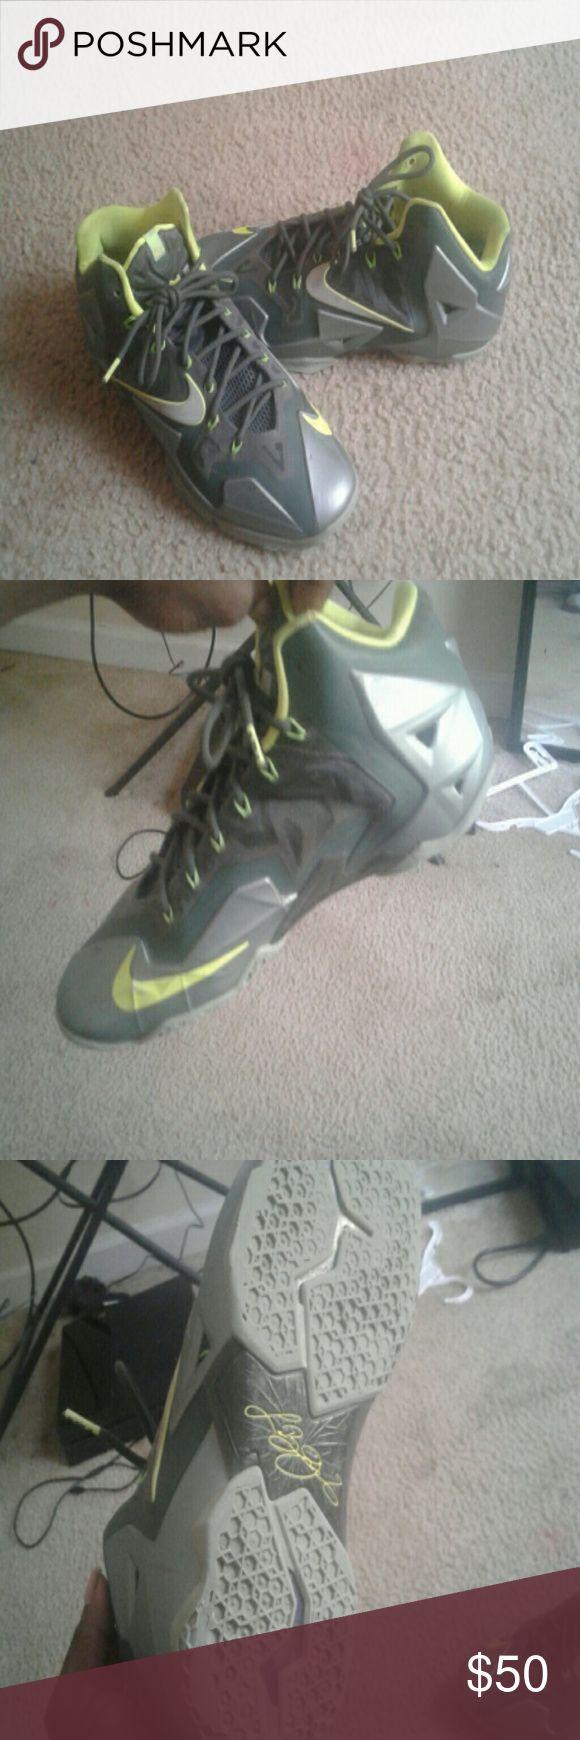 Nike LeBron 11 Basketball Shoes Nike Shoes Athletic Shoes